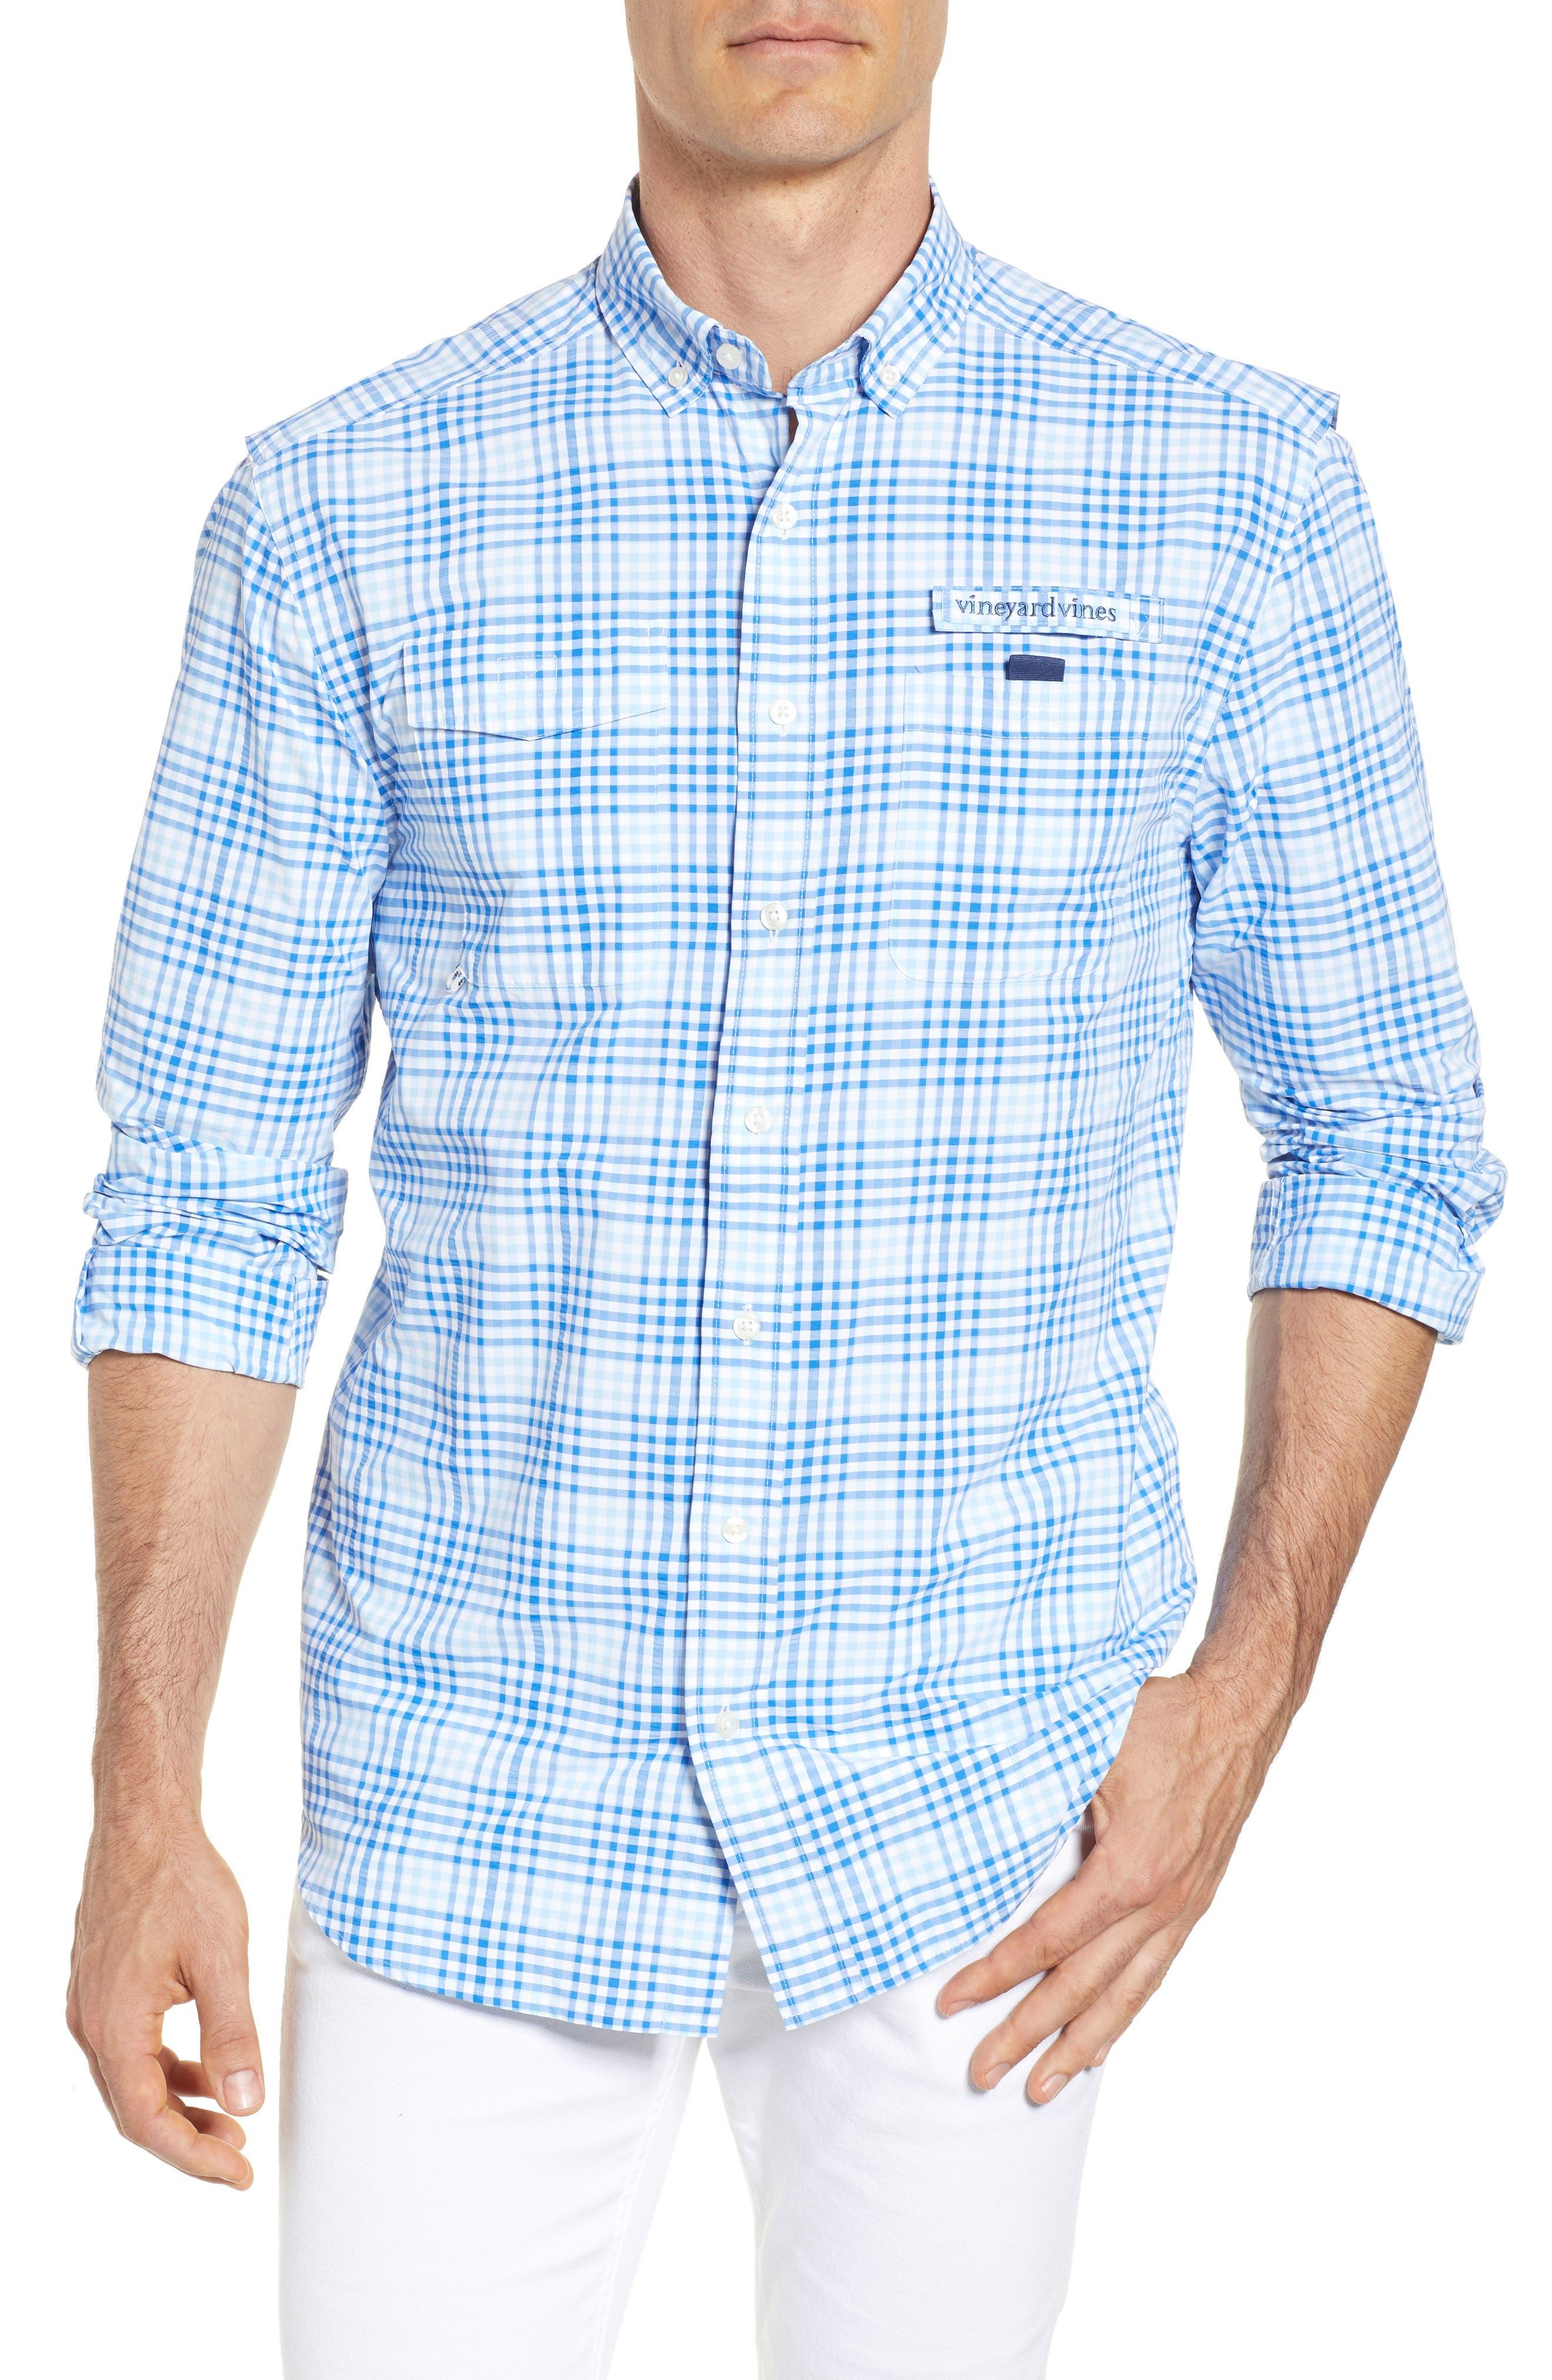 South Shore Harbor Regular Fit Plaid Performance Sport Shirt,                         Main,                         color, JAKE BLUE